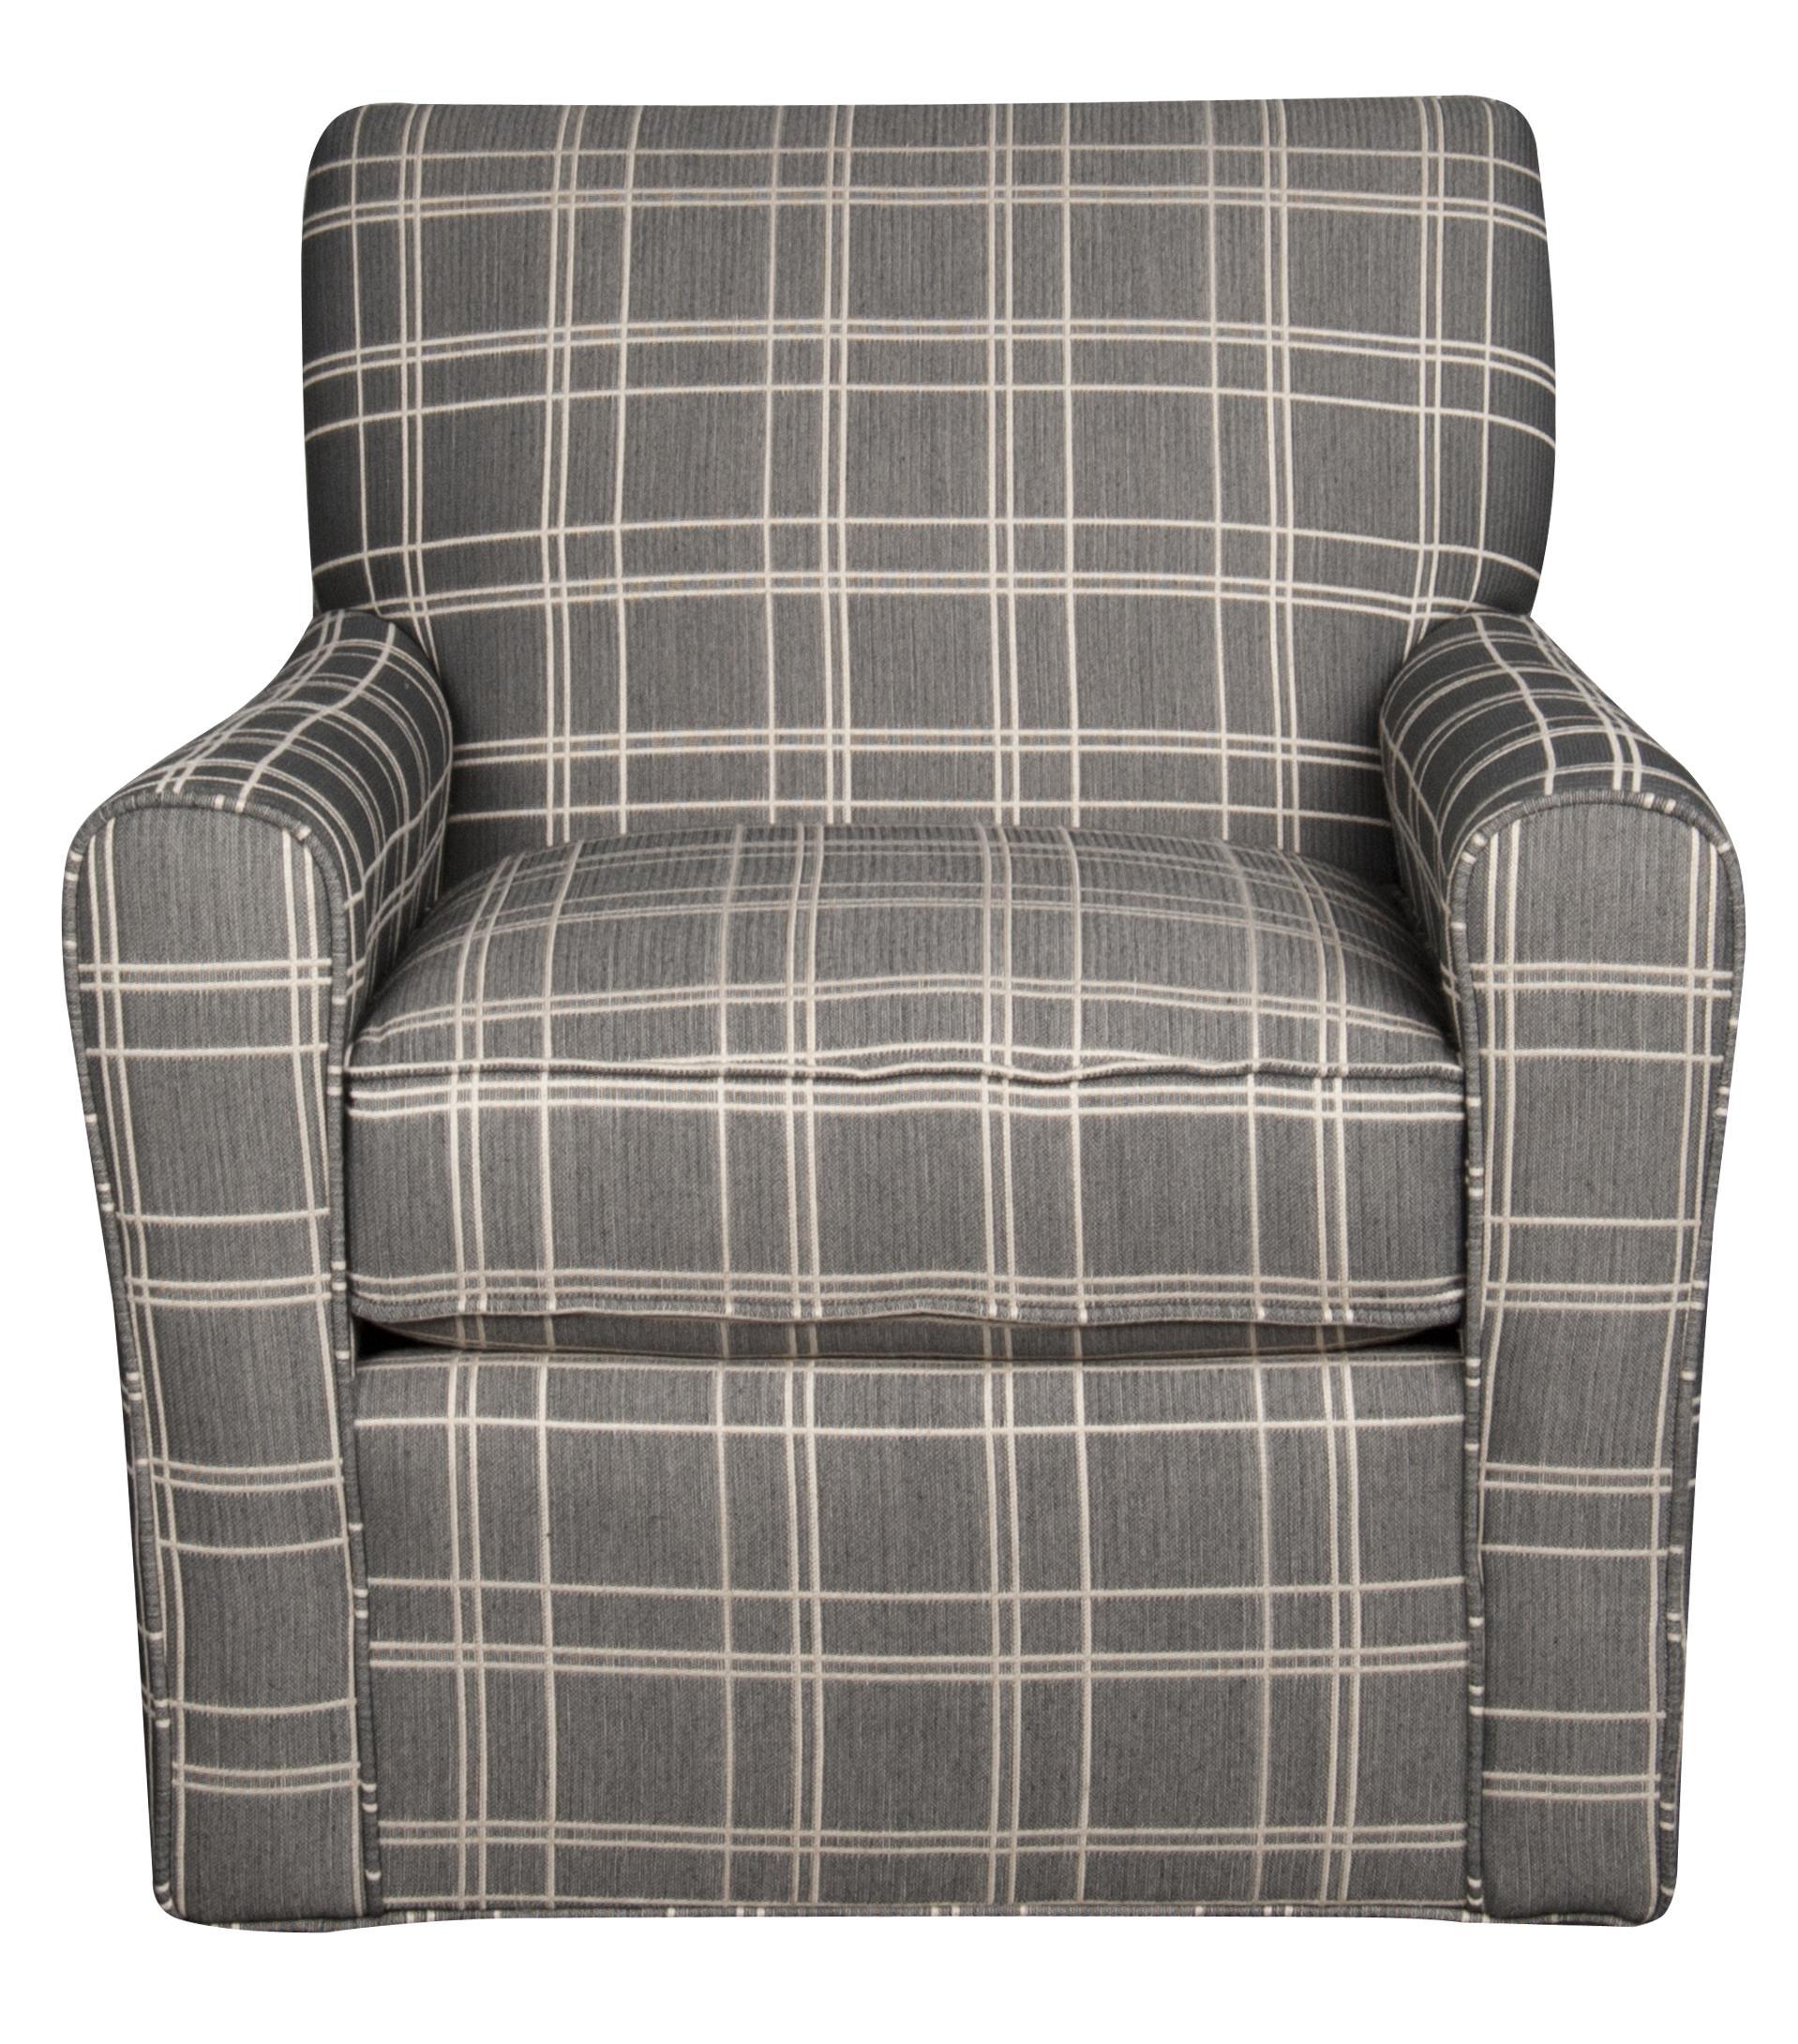 Main & Madison Sarah Sarah Swivel Chair - Item Number: 900647693